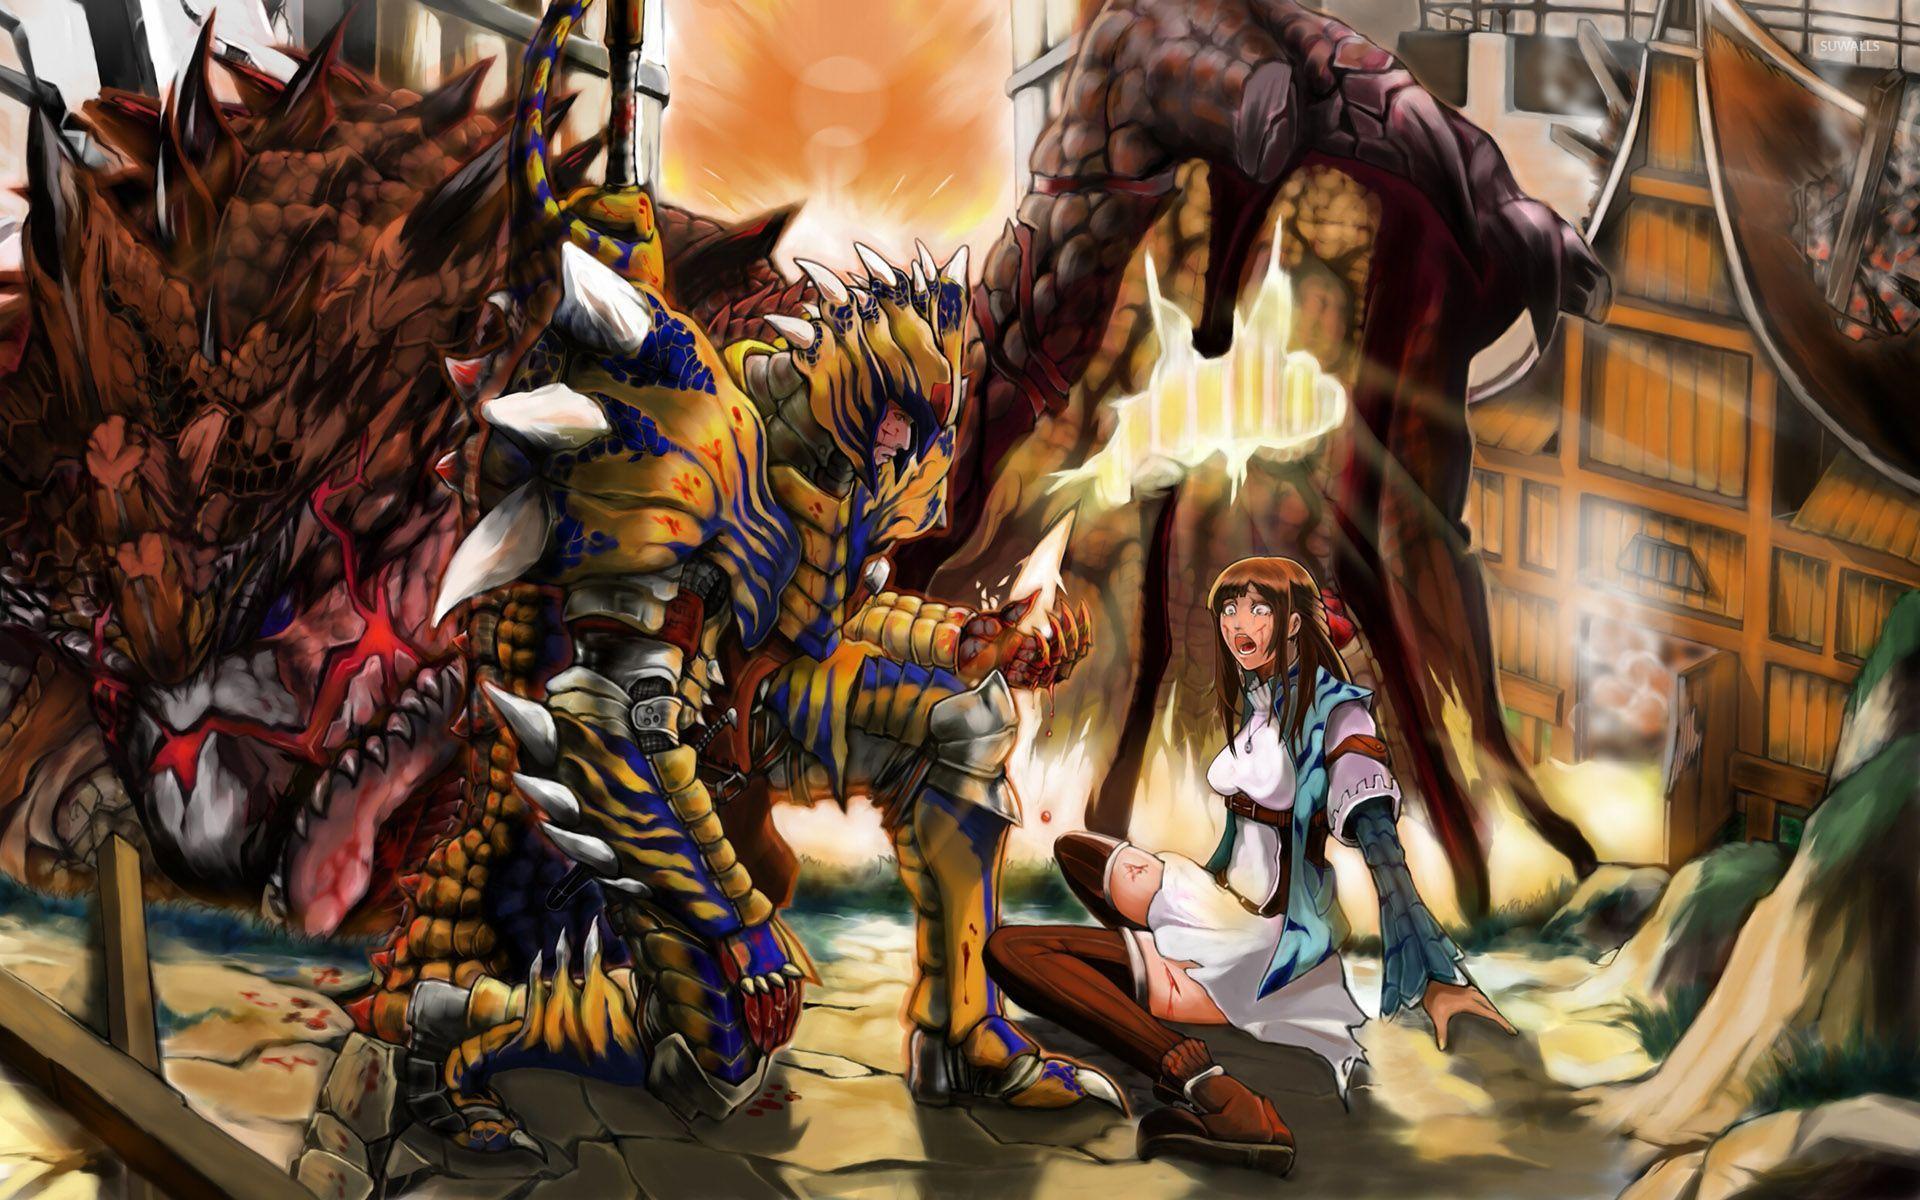 Monster hunter 8 wallpaper game wallpapers 29271 monster hunter 8 wallpaper voltagebd Images